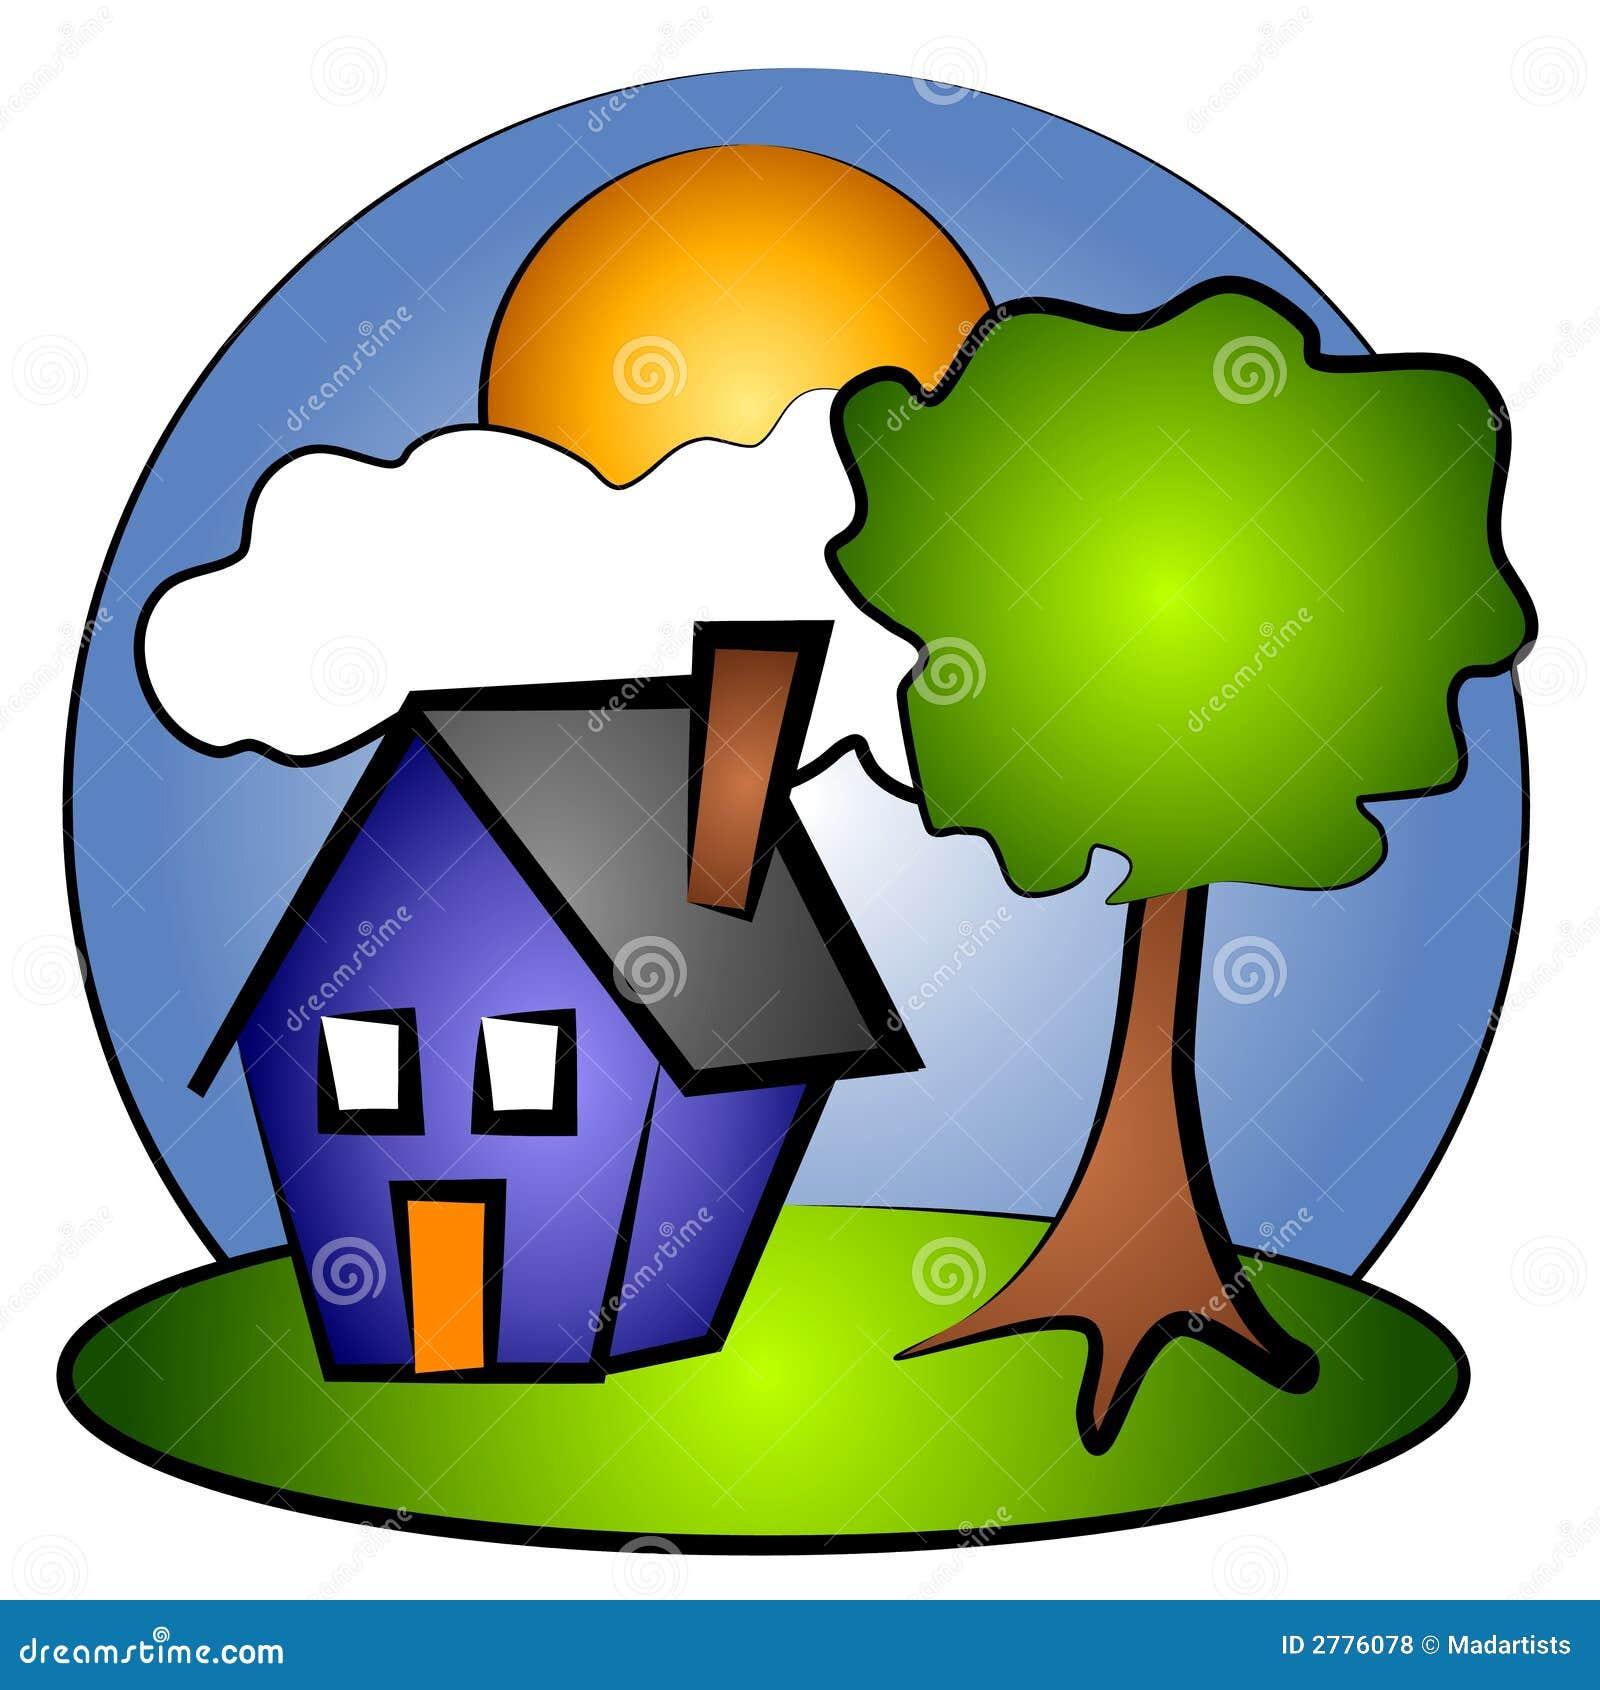 house rural scene clip art 2 stock illustration illustration of rh dreamstime com house clipart free download free clipart house